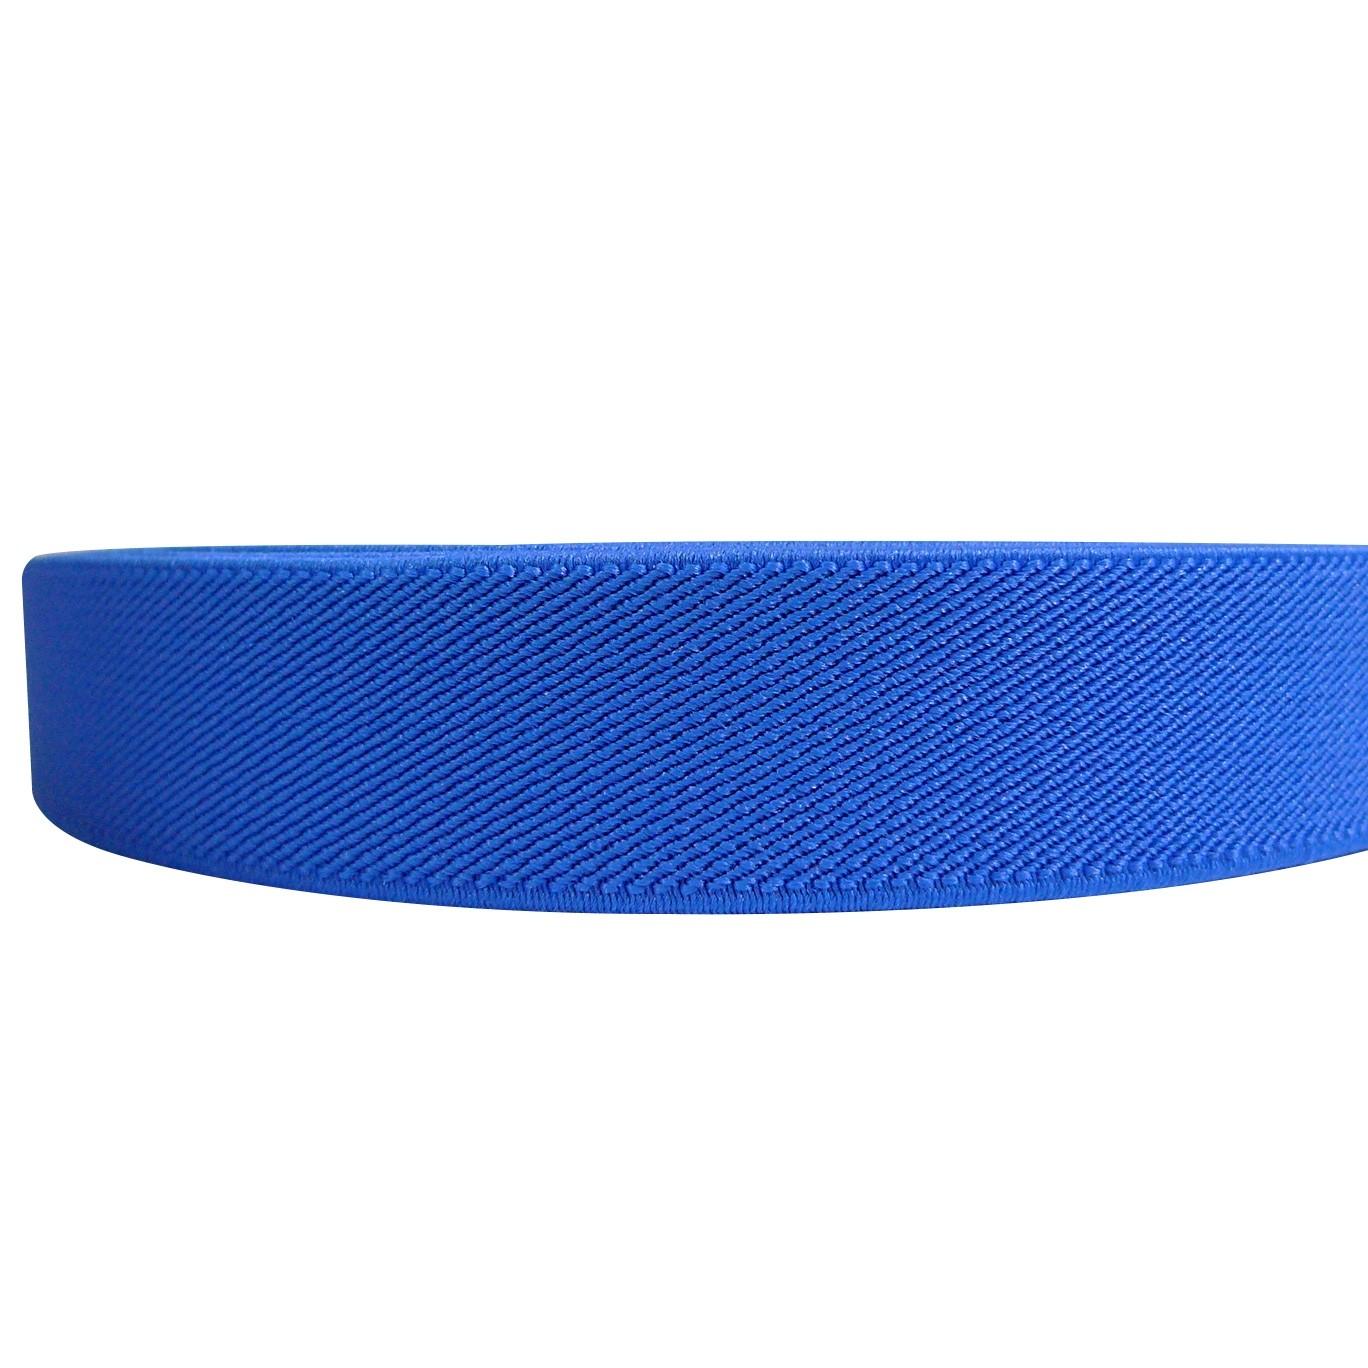 "12 Meters 1"" 25mm Solid Royal Blue Color Suspender Elastic Webbing Wholesale"